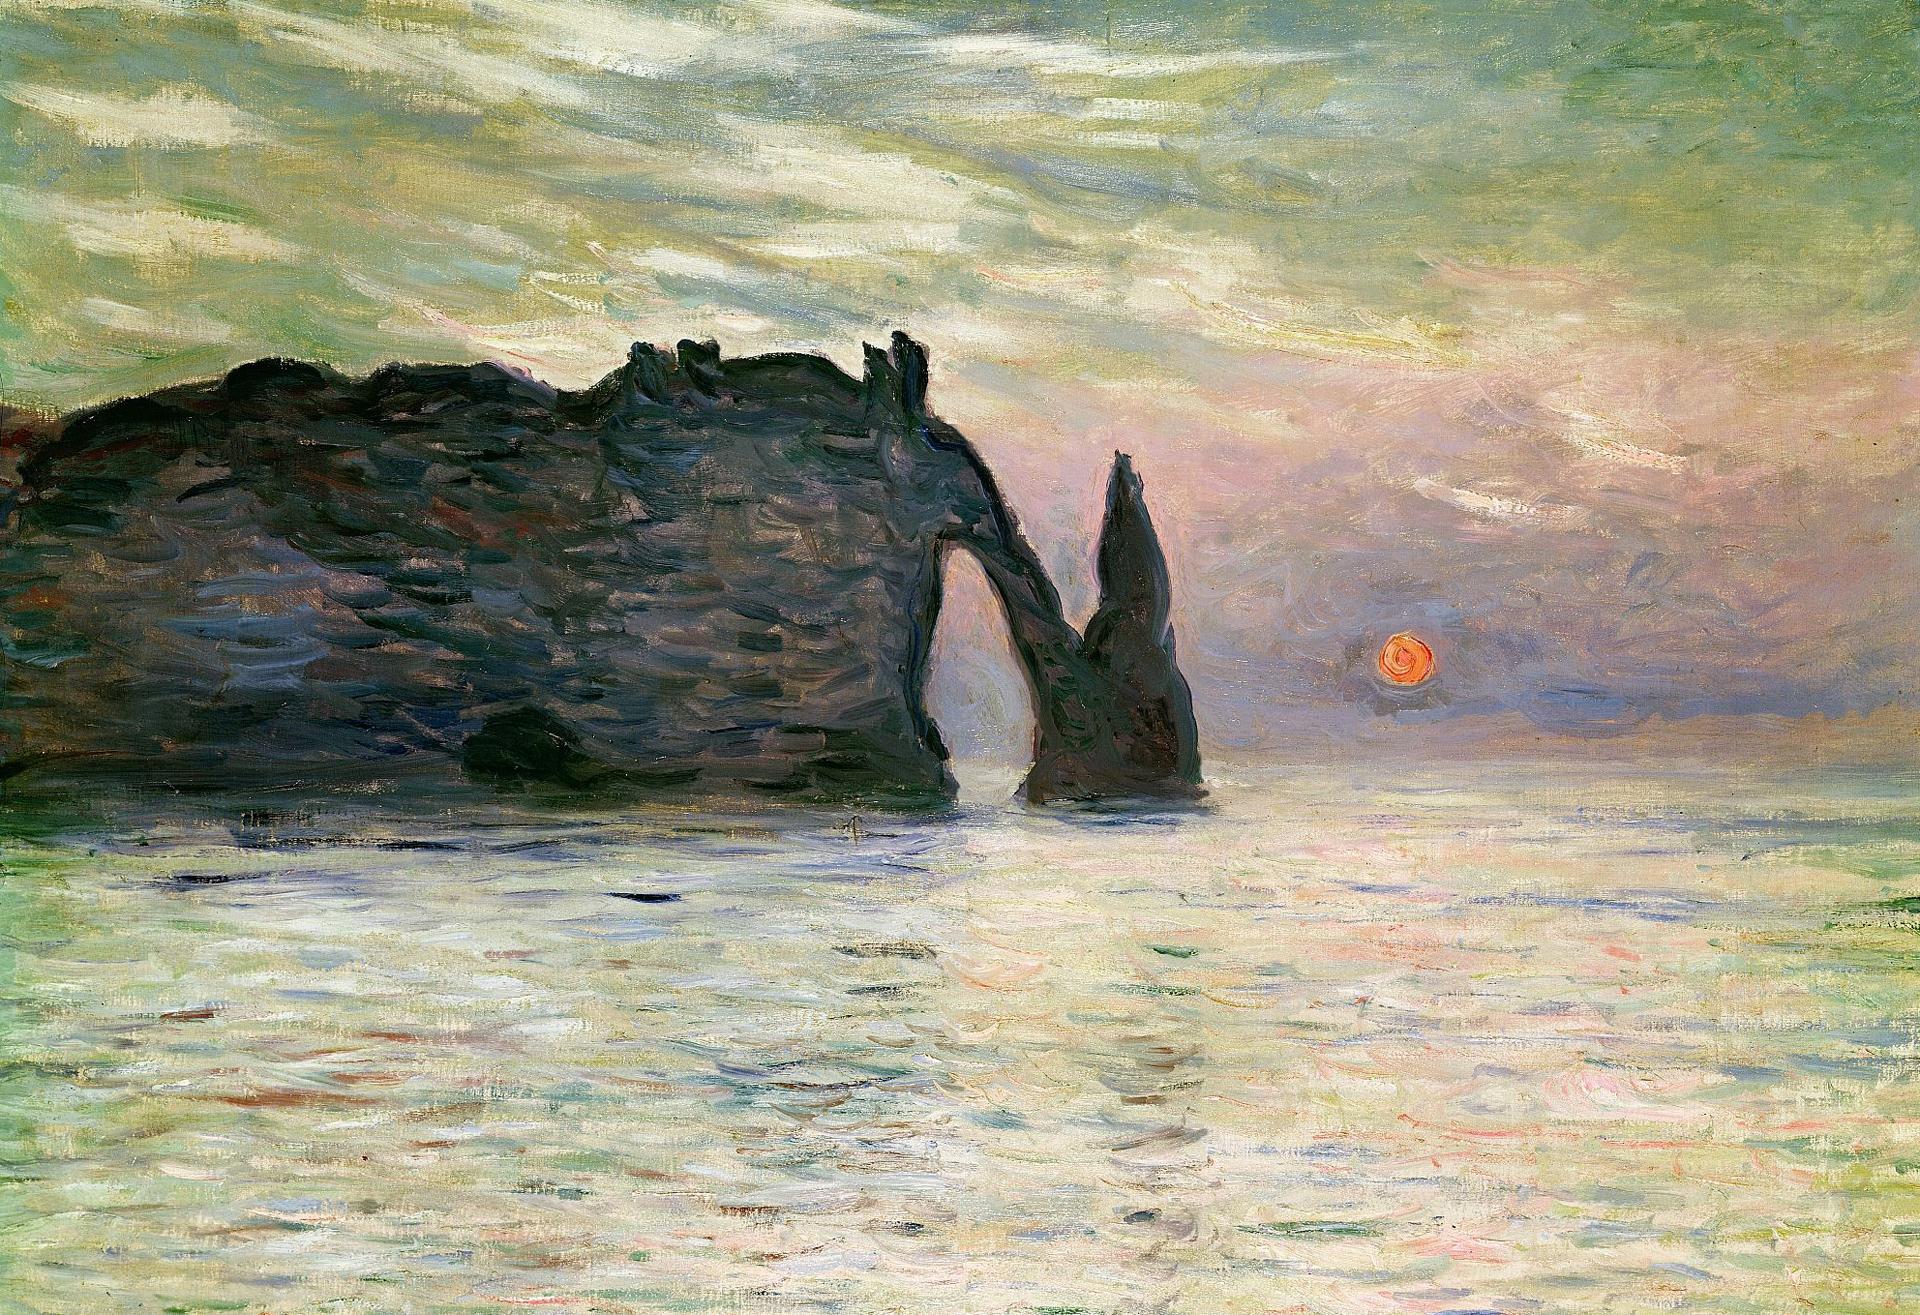 скалы и море < Этрета, закат >:: Клод Моне, описание картины - Claude Monet фото